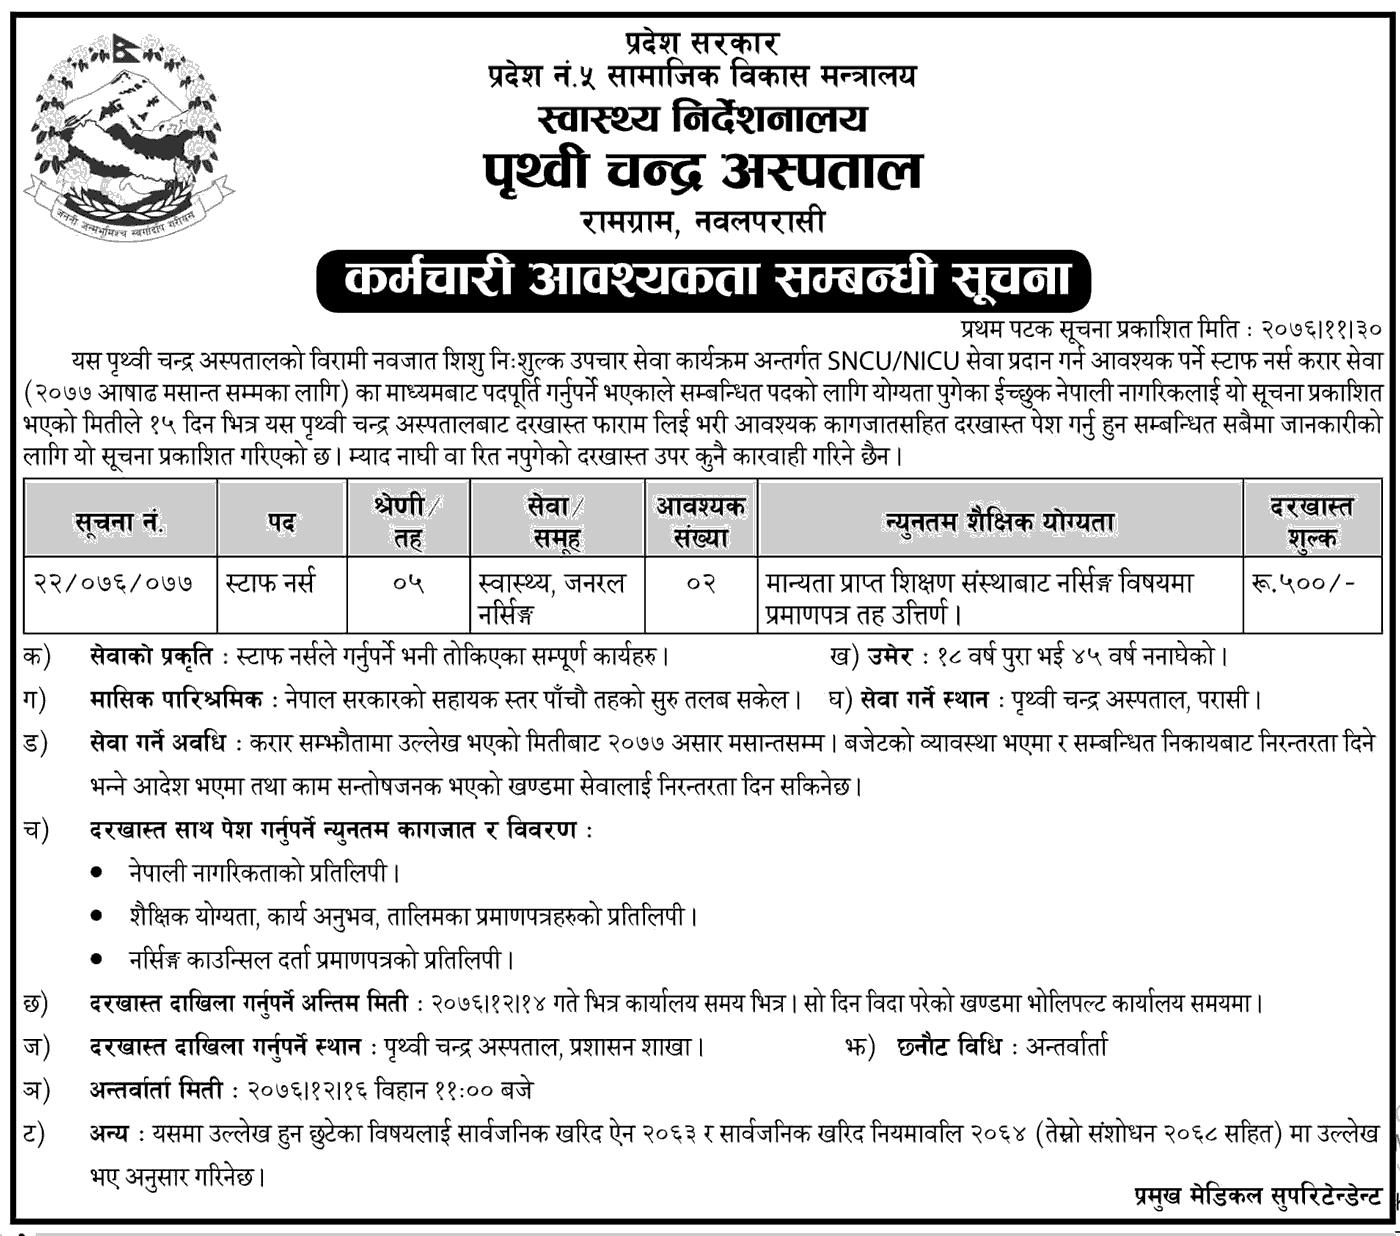 Prithvi Chandra Hospital Vacancy for Staff Nurses